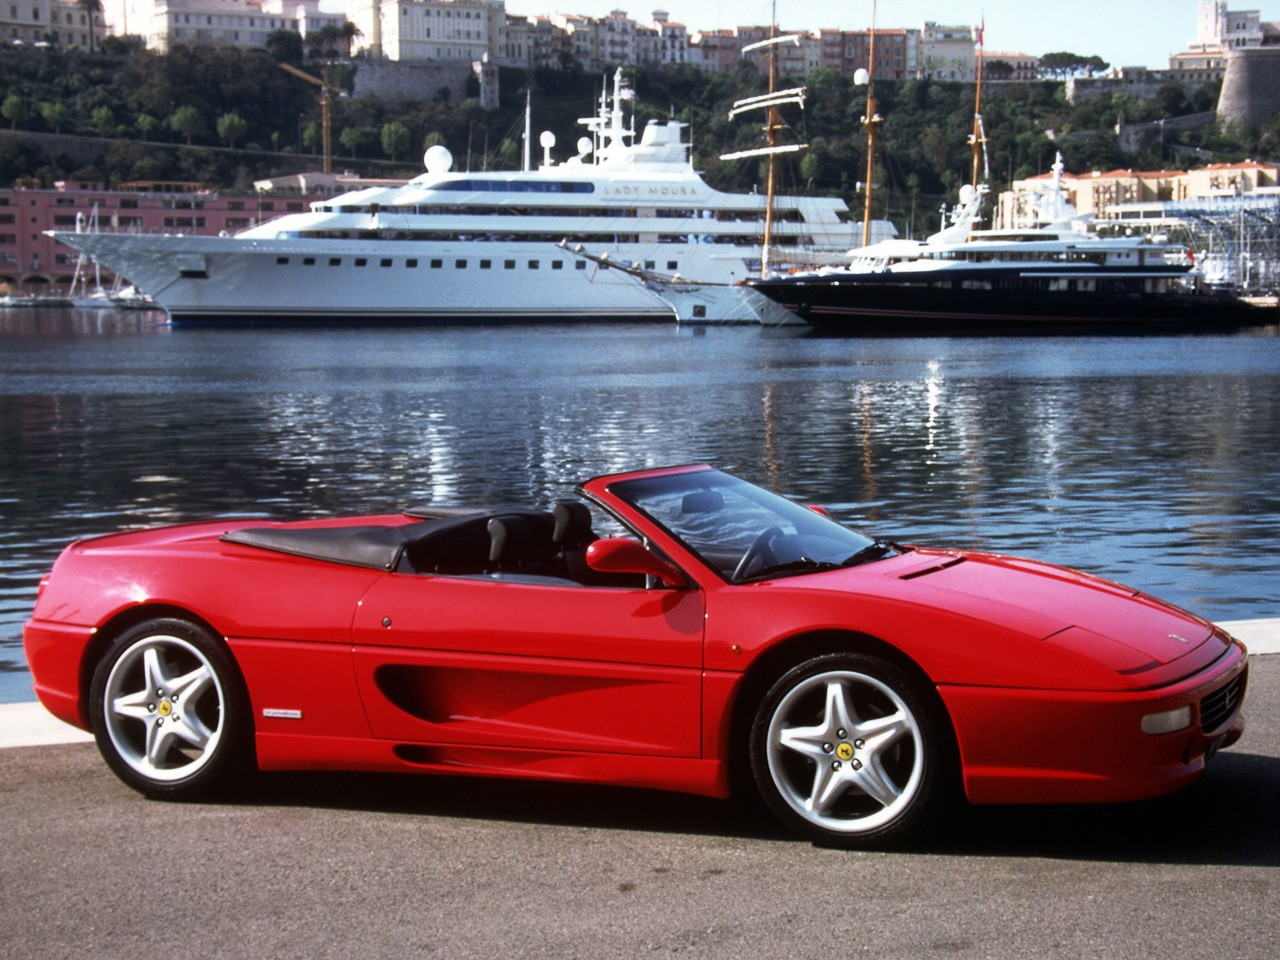 Ferrari 458 Spider Cars Com >> FERRARI F355 Spider - 1995, 1996, 1997, 1998, 1999 - autoevolution